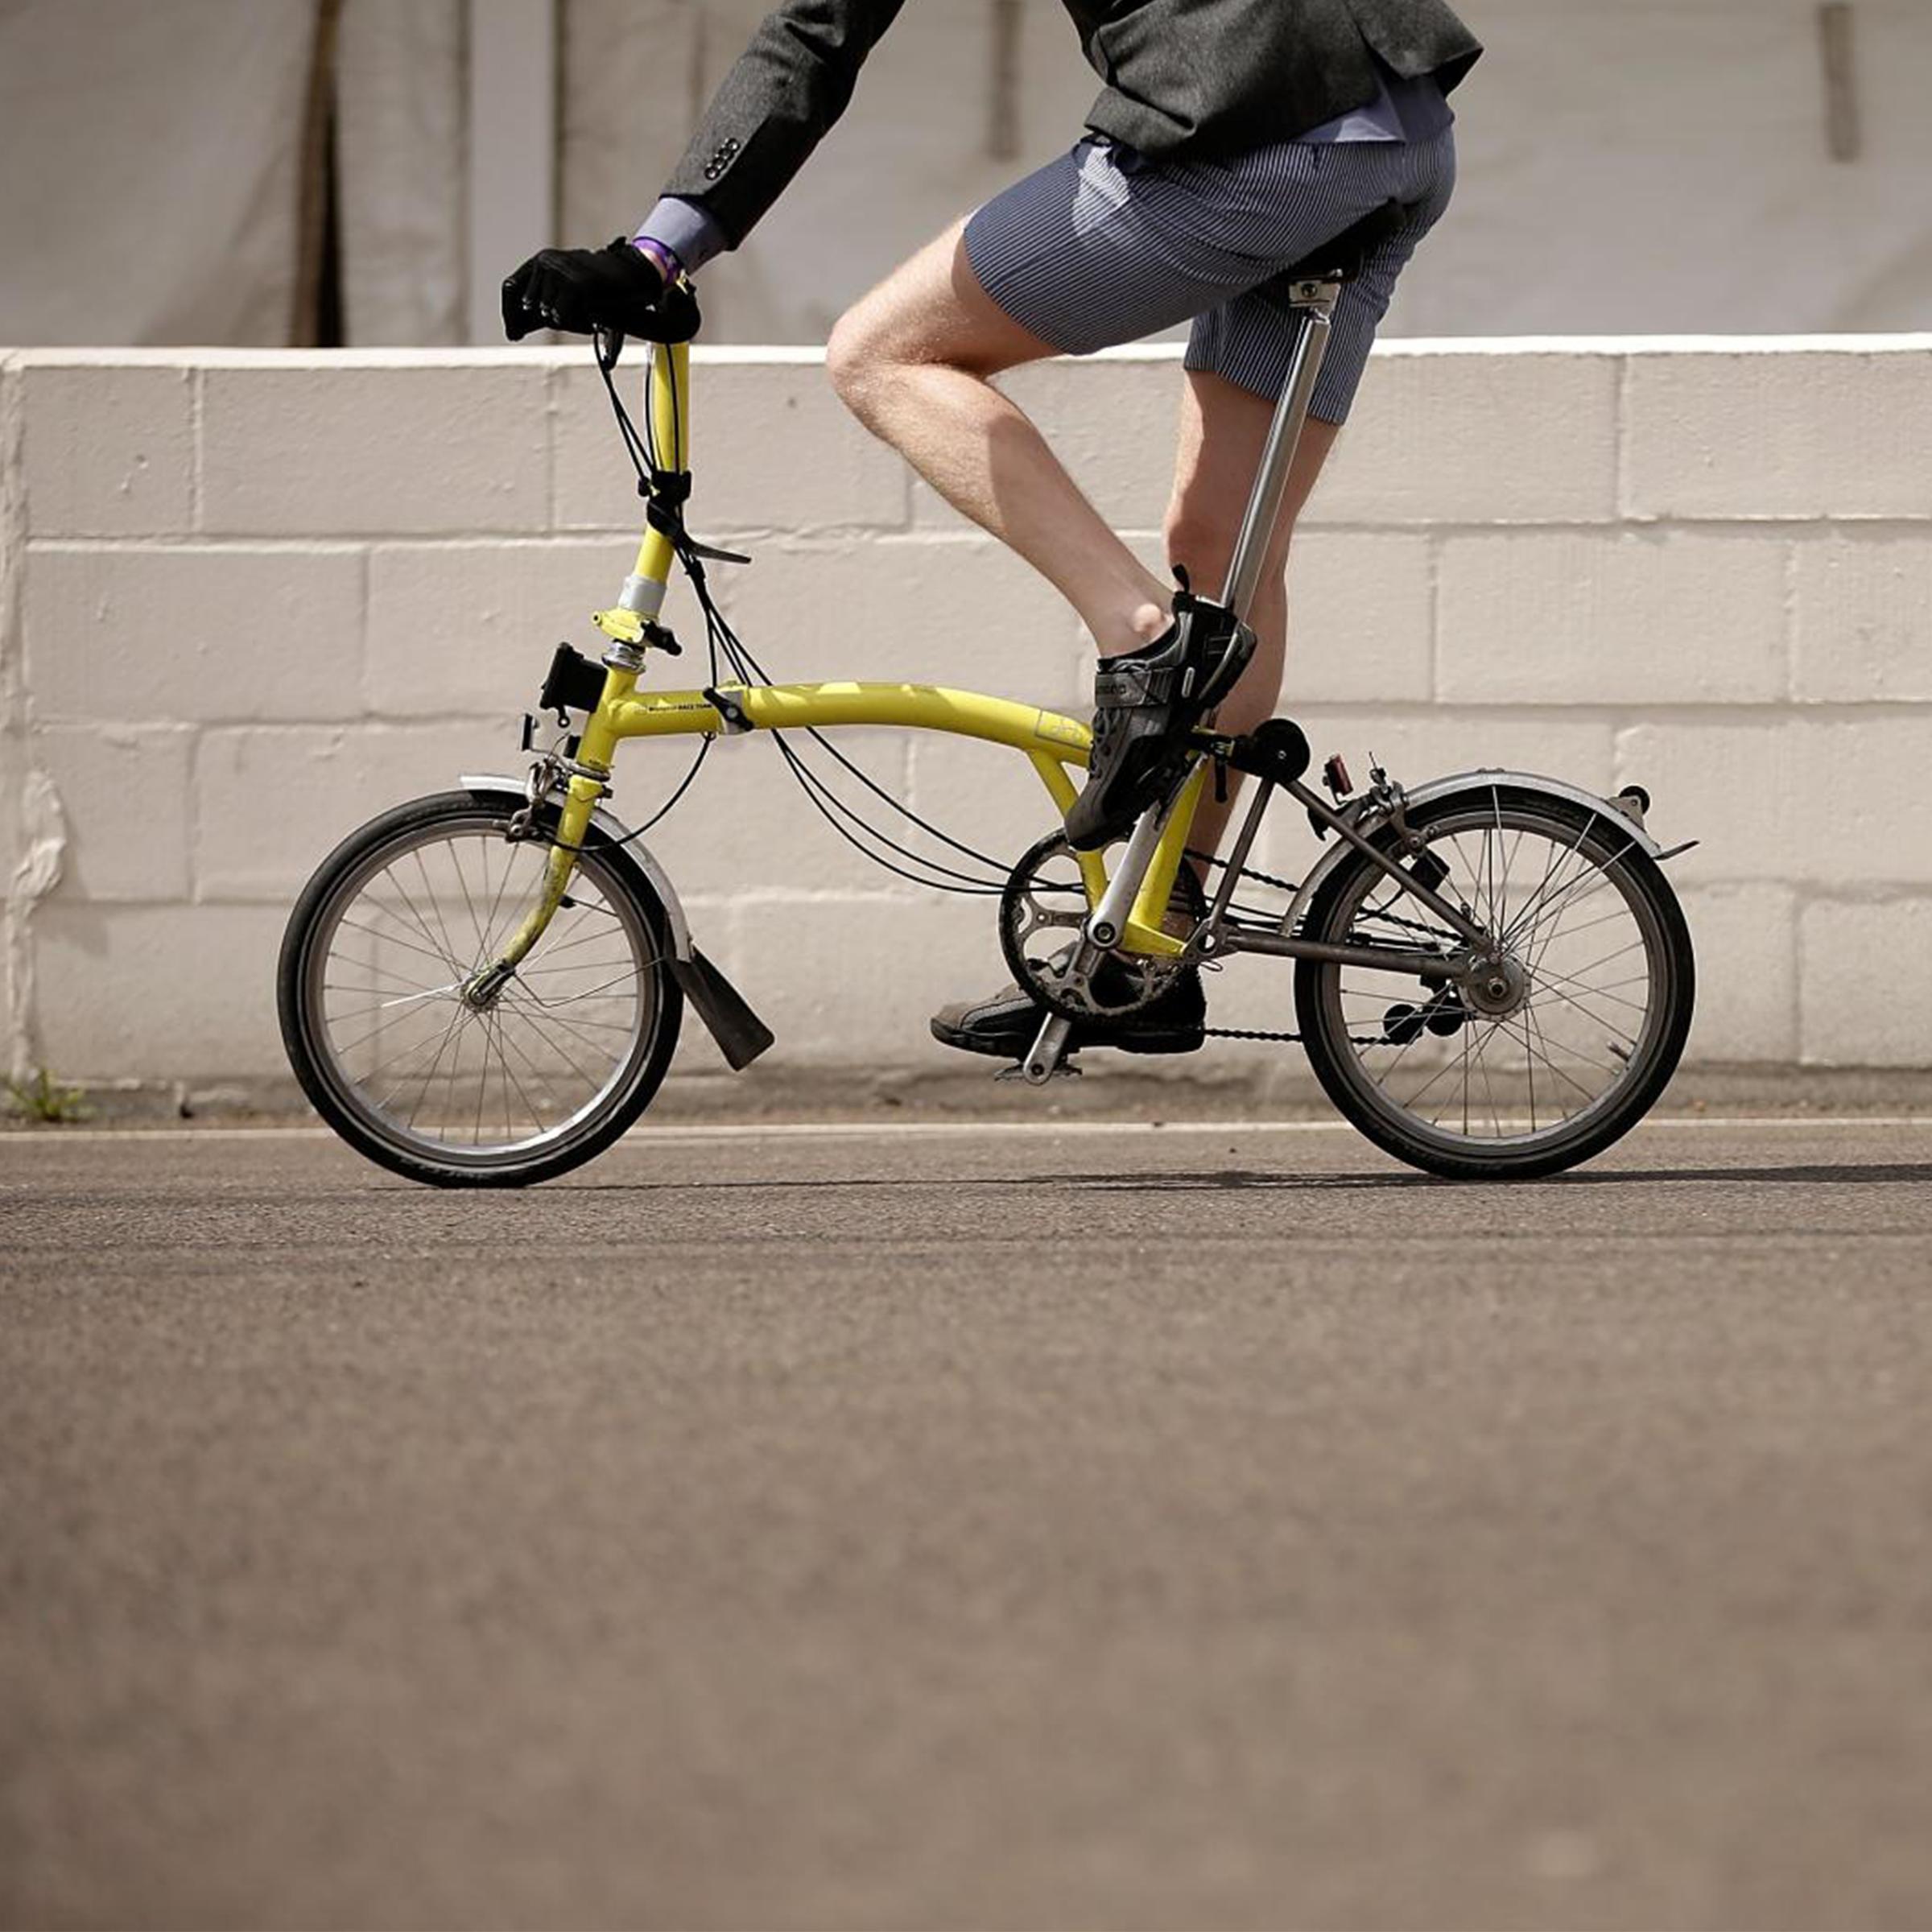 Designapplause Brompton Folding Bike